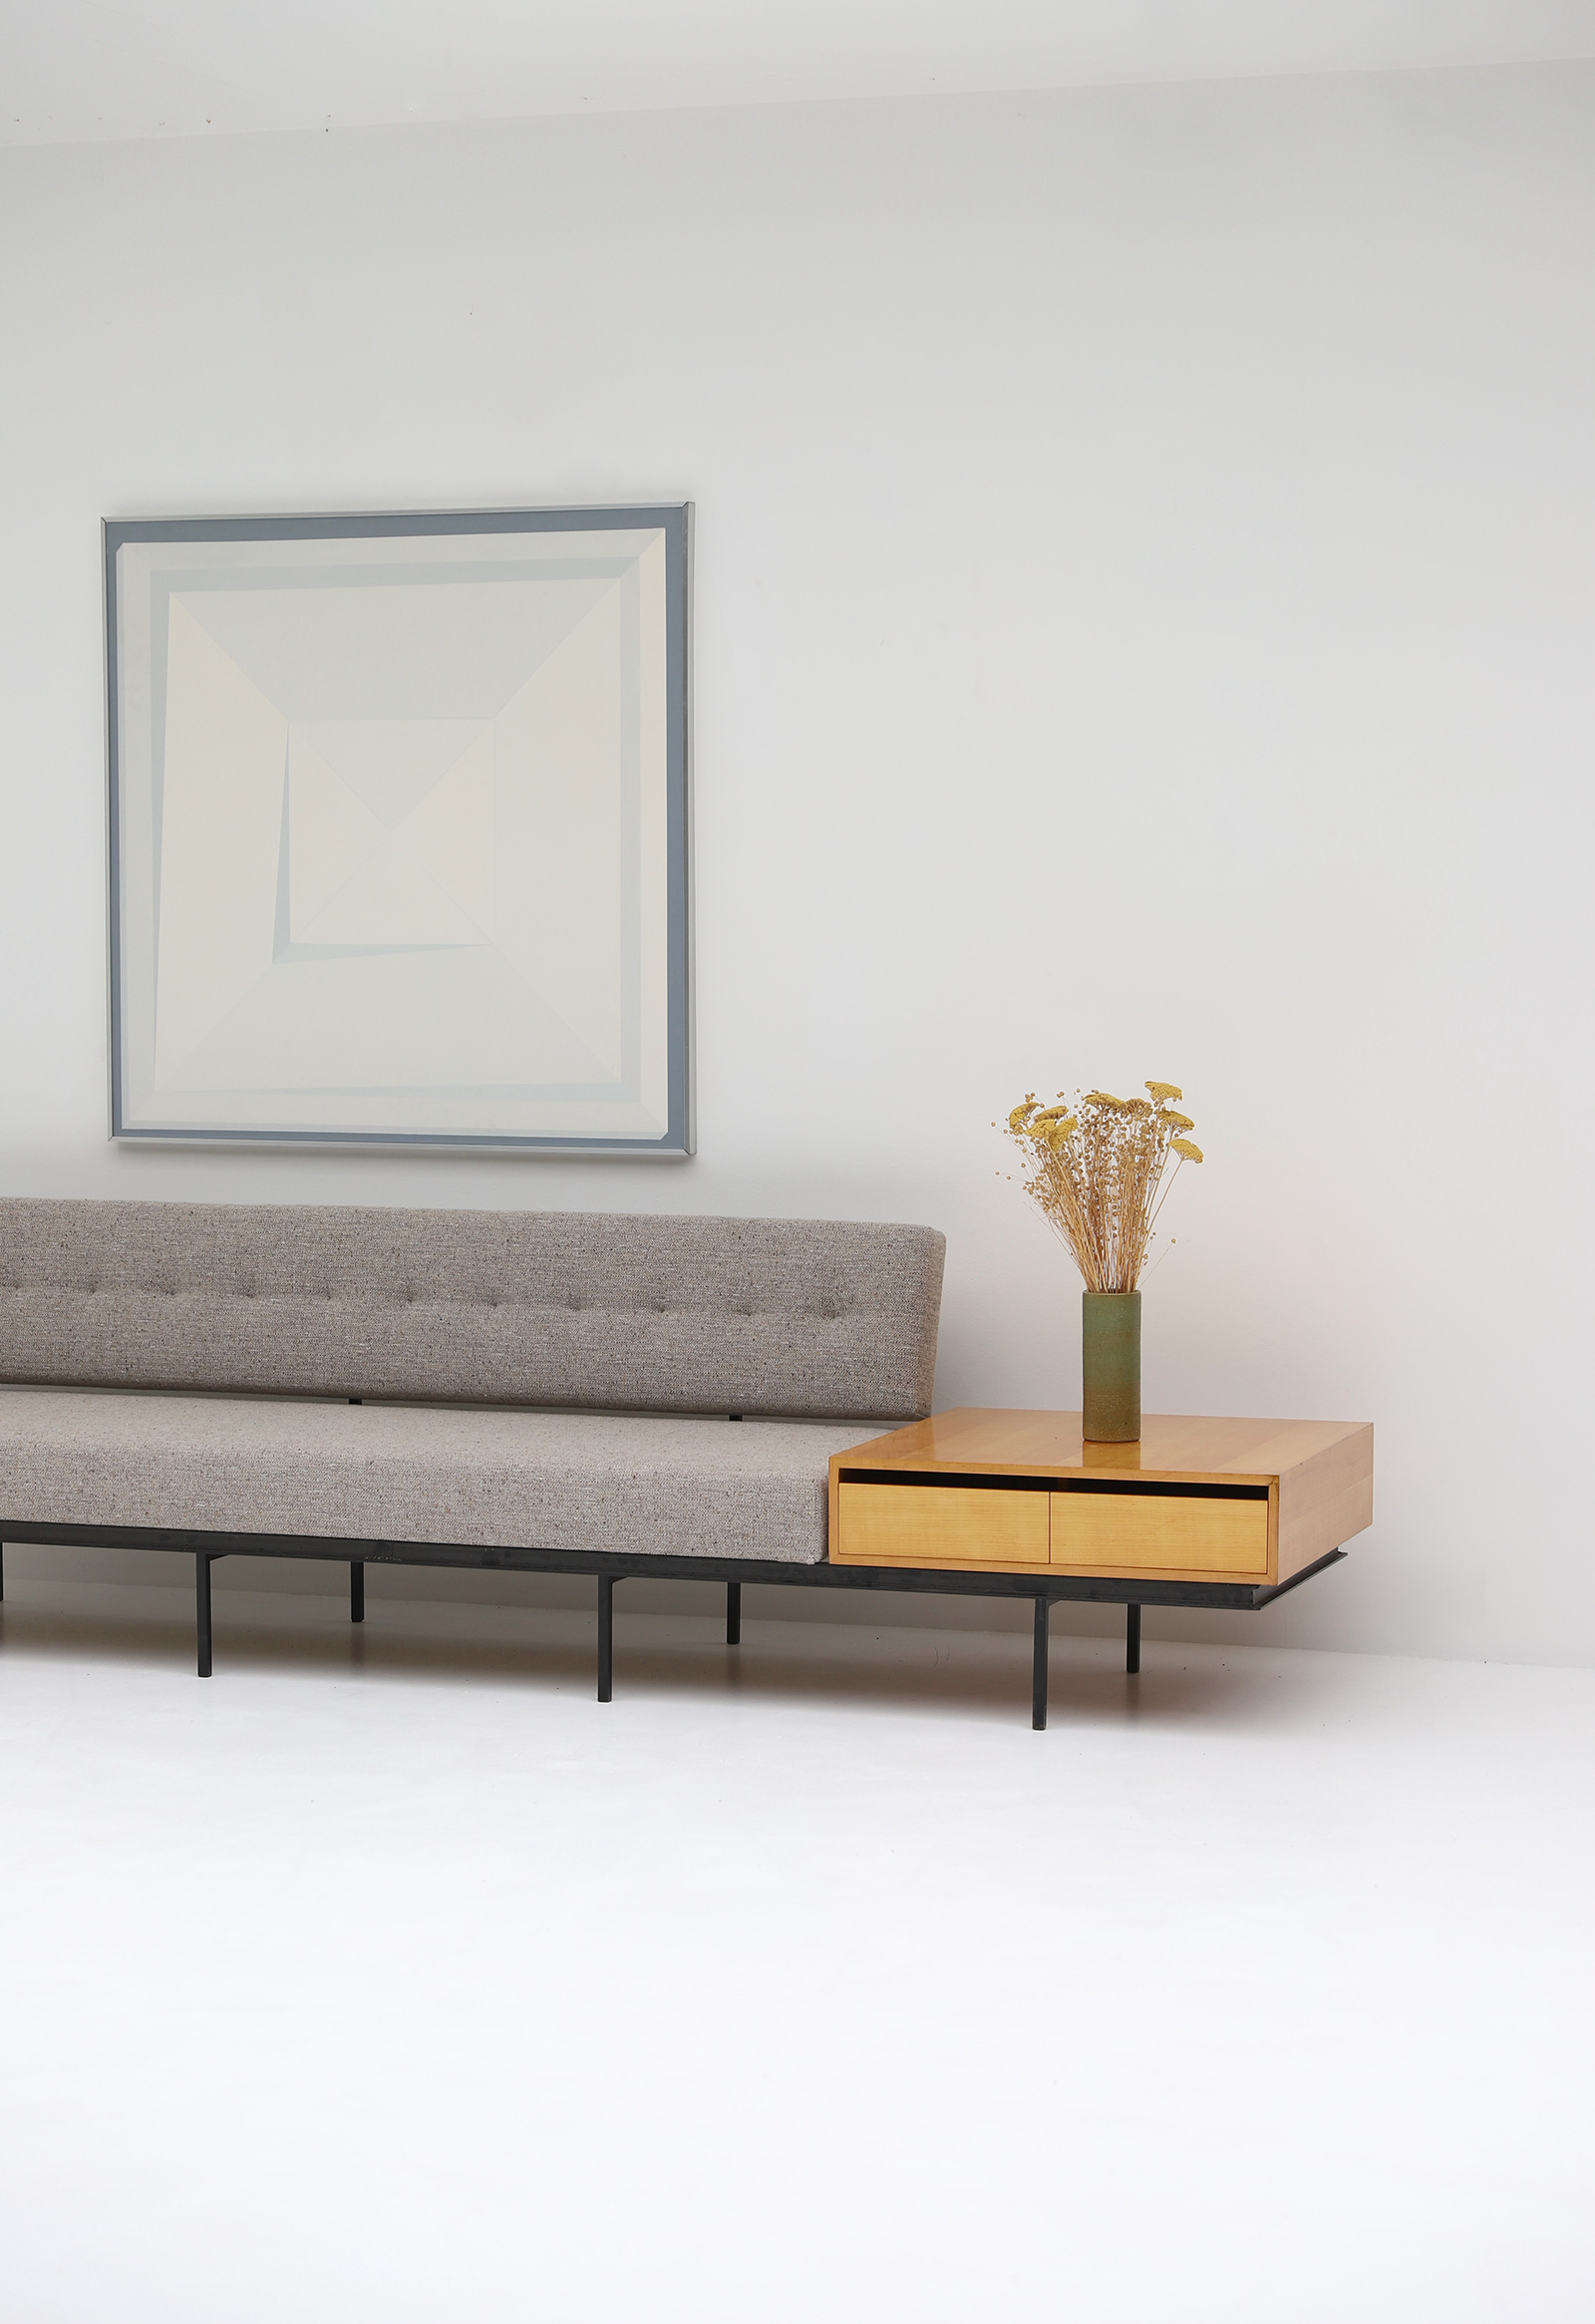 Florence Knoll Sofa & Cabinet image 3